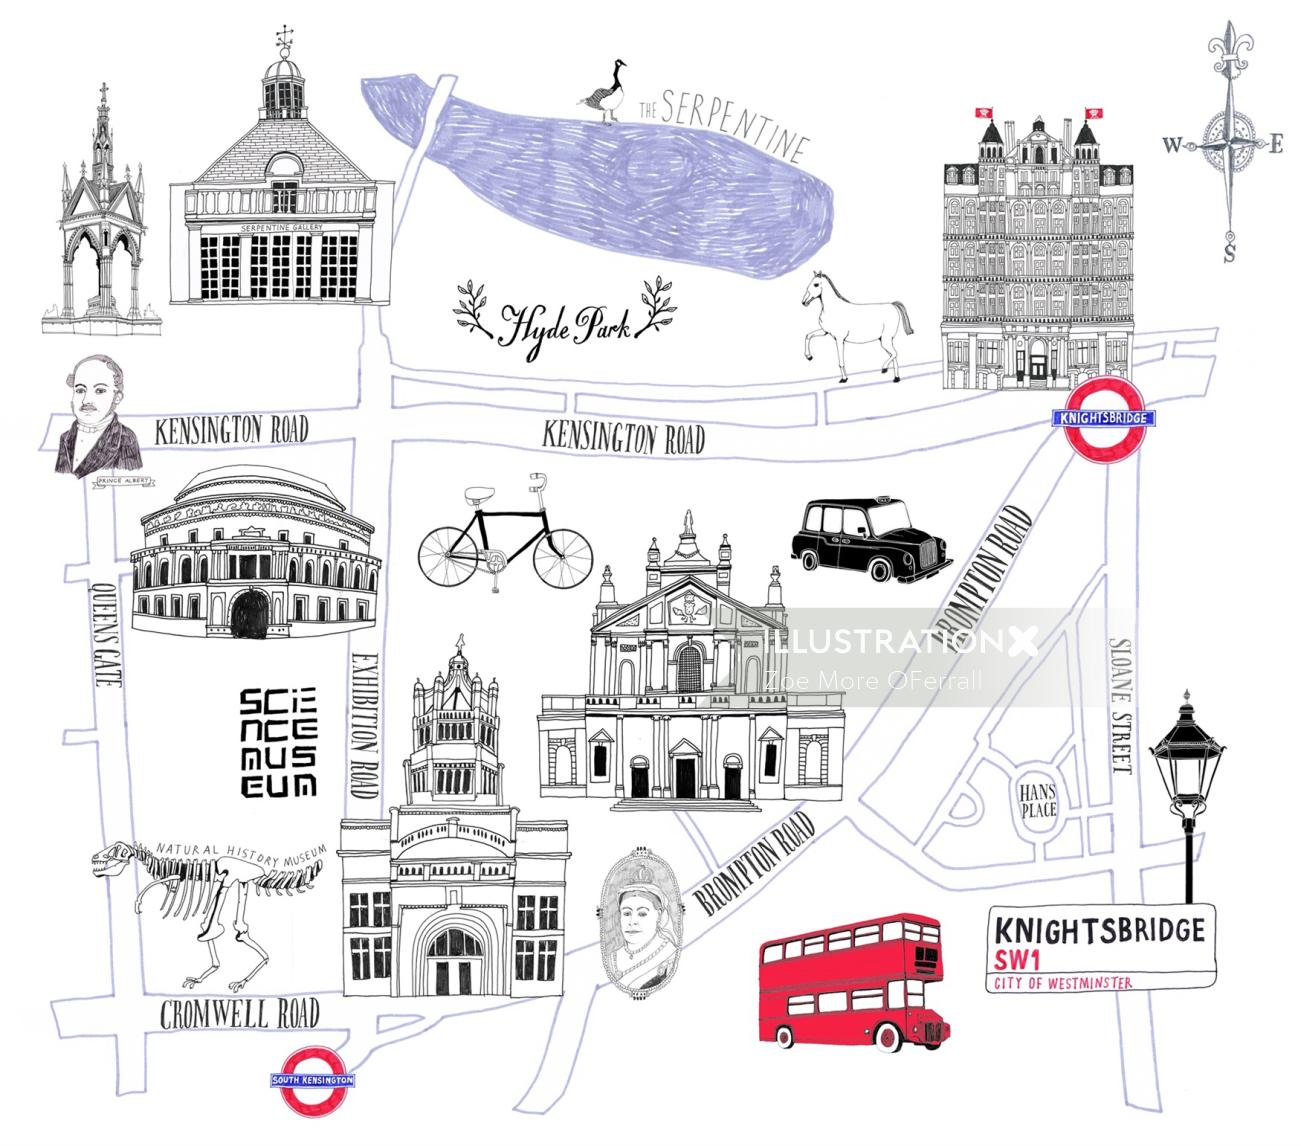 KnightBridge street map